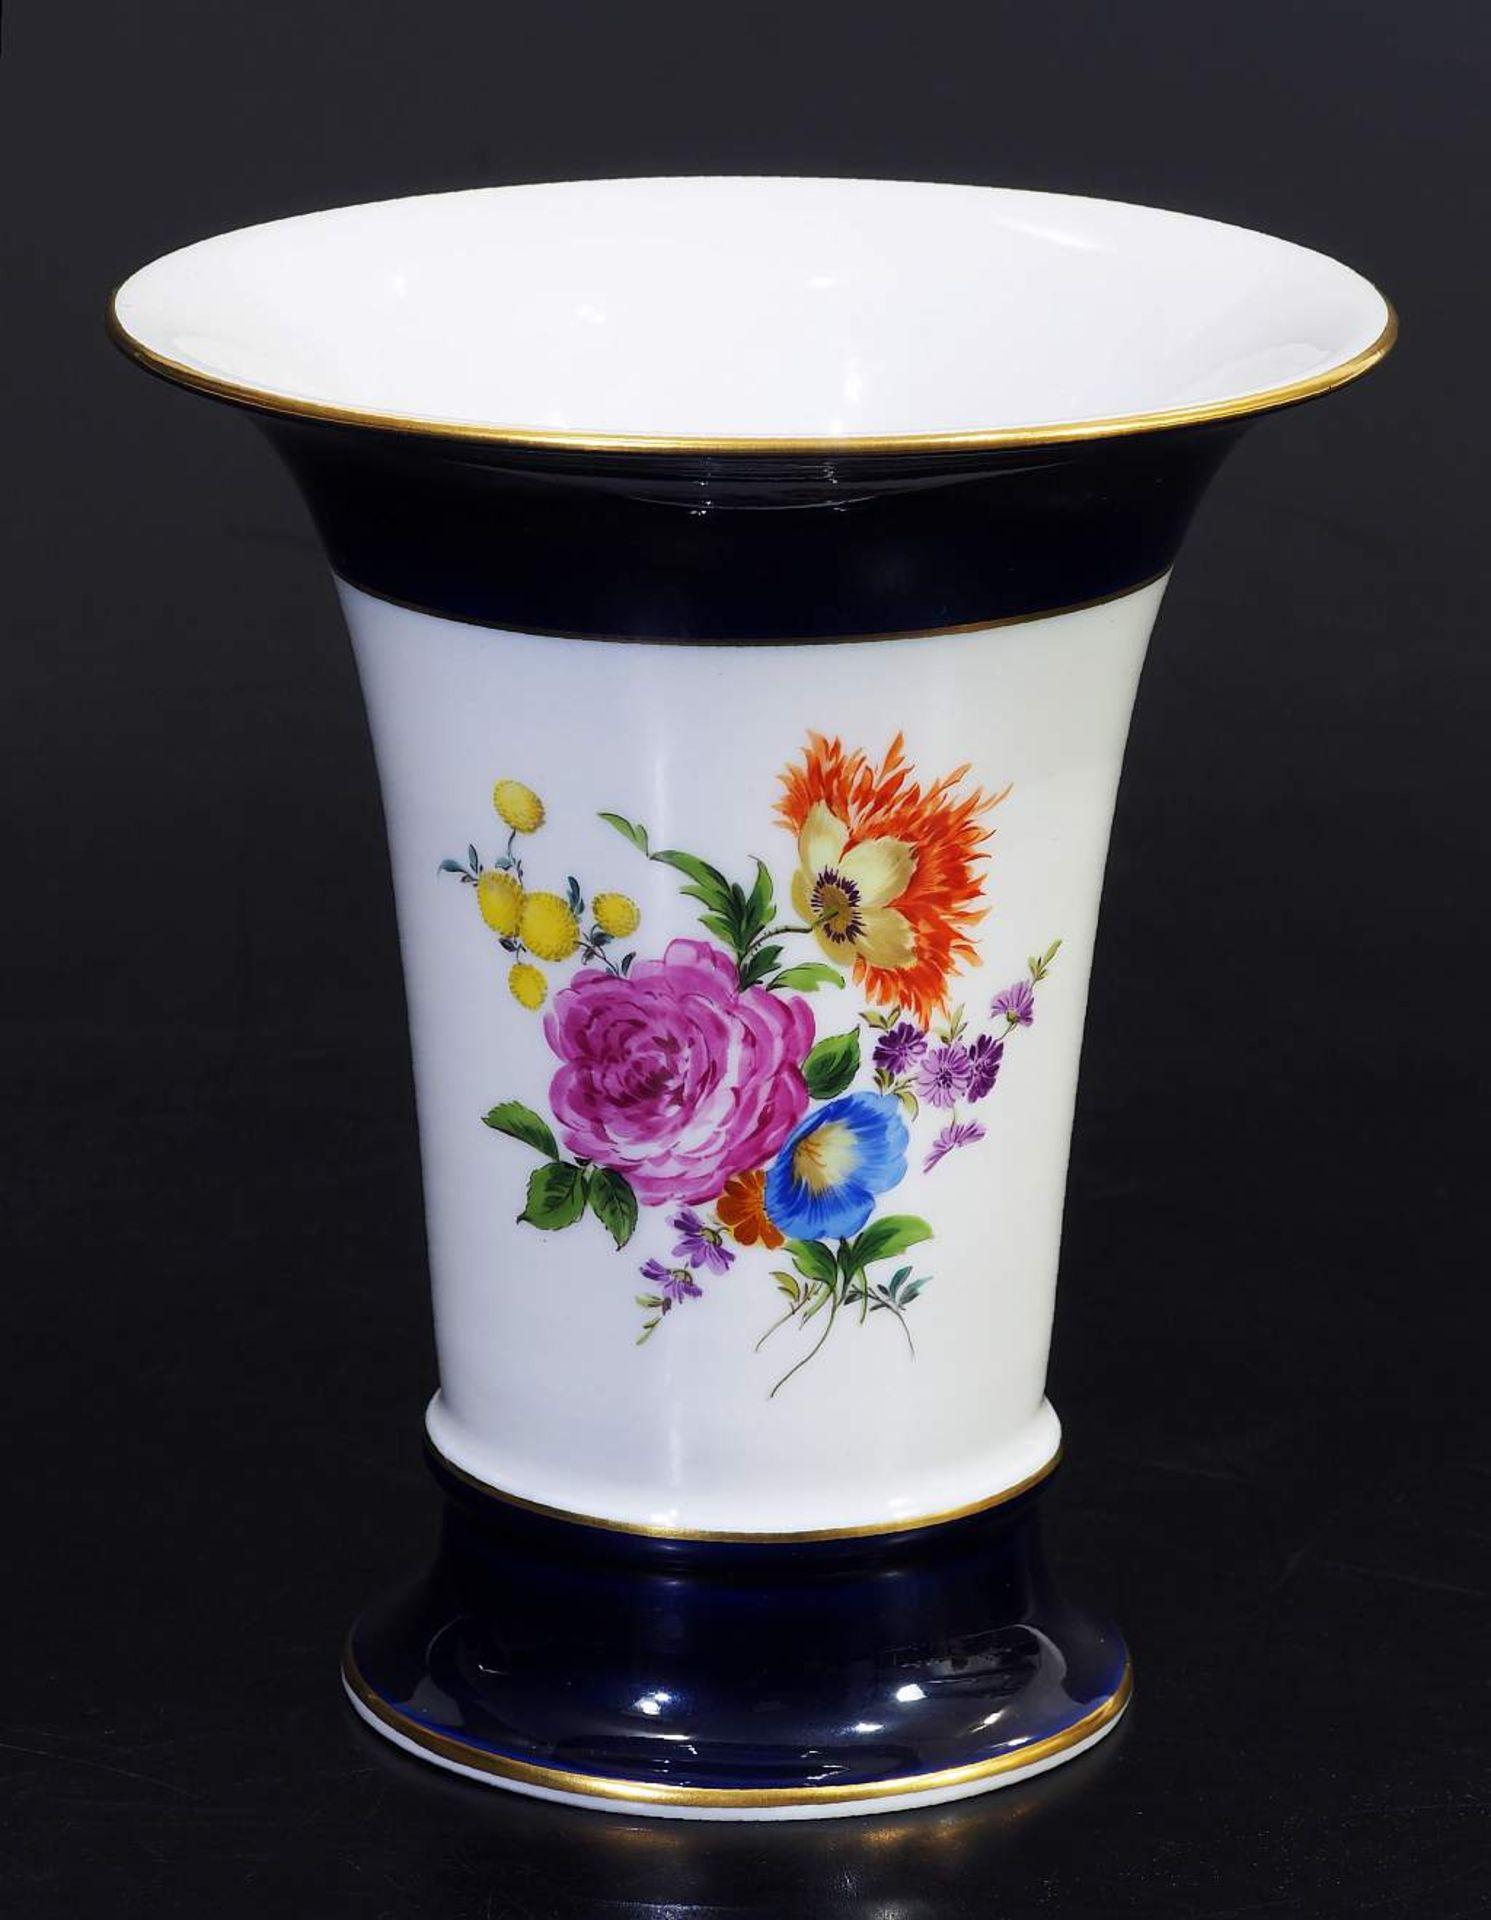 Los 21 - Kobalt Vase. Kobalt-Vase. MEISSEN 1957 - 1972, Modelljahr 1918, Modellnummer 478. Gefußter konischer